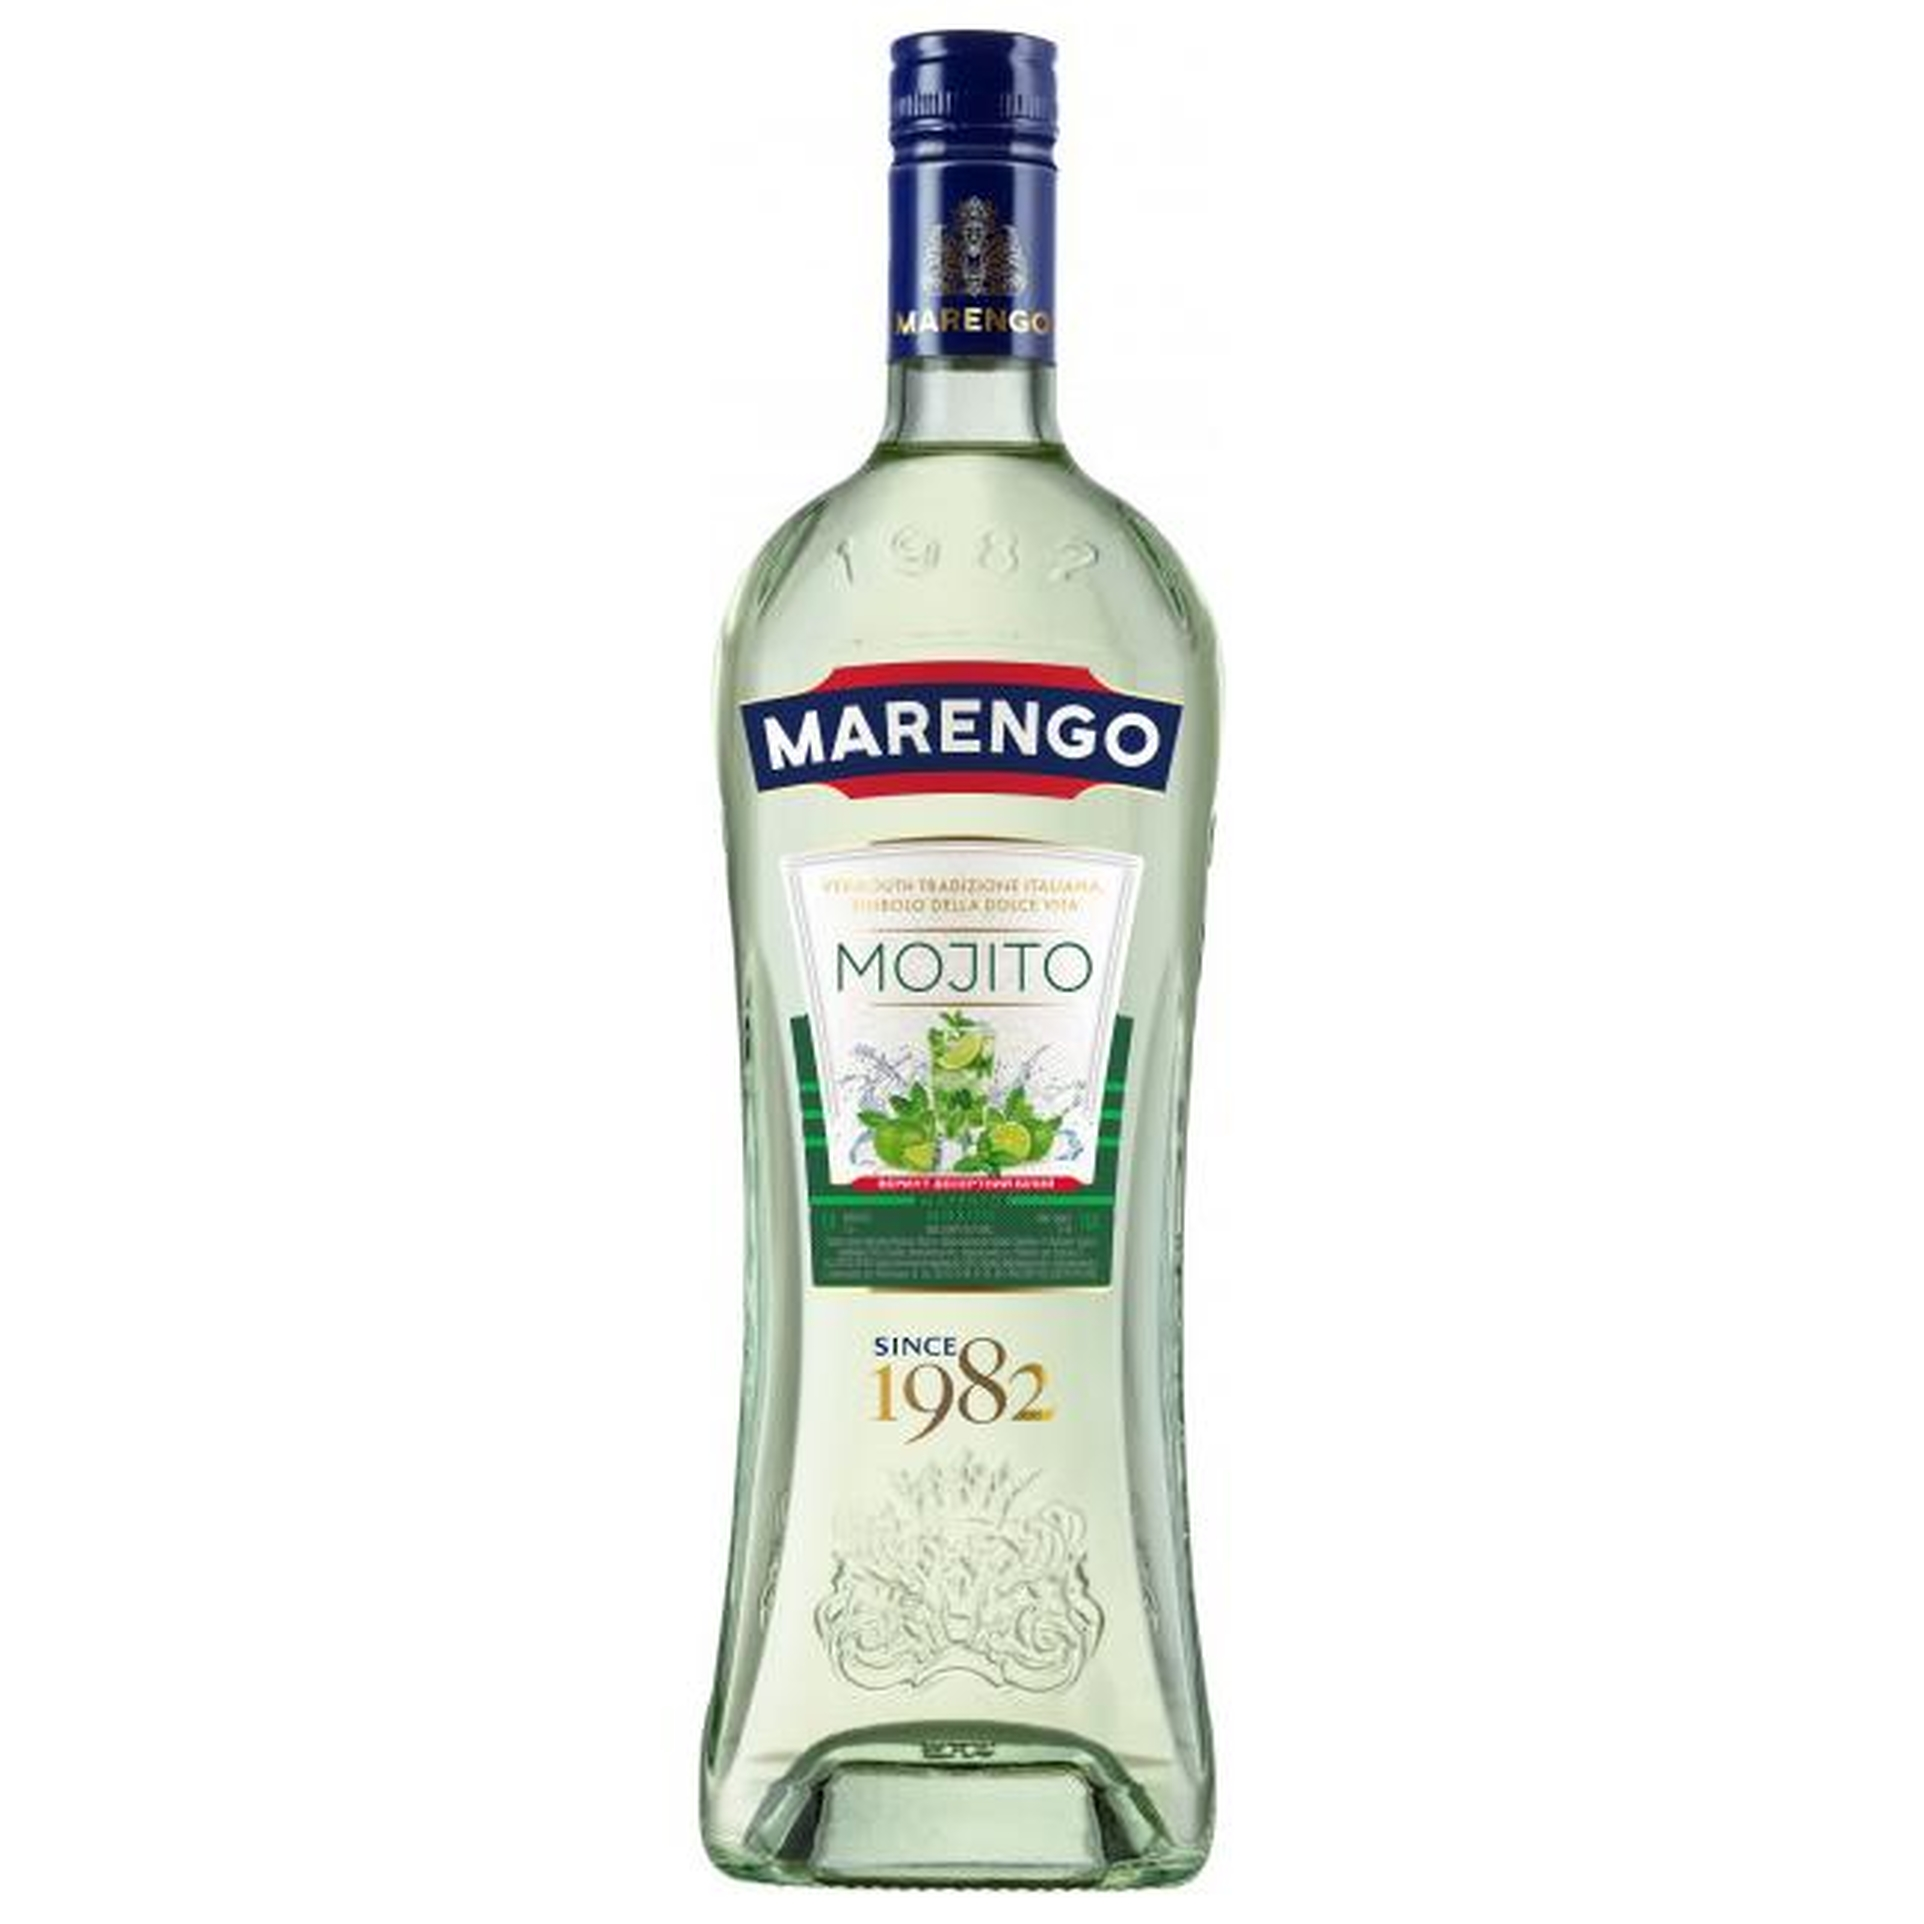 Delivery vermouth Marengo Mojito night on Kiev